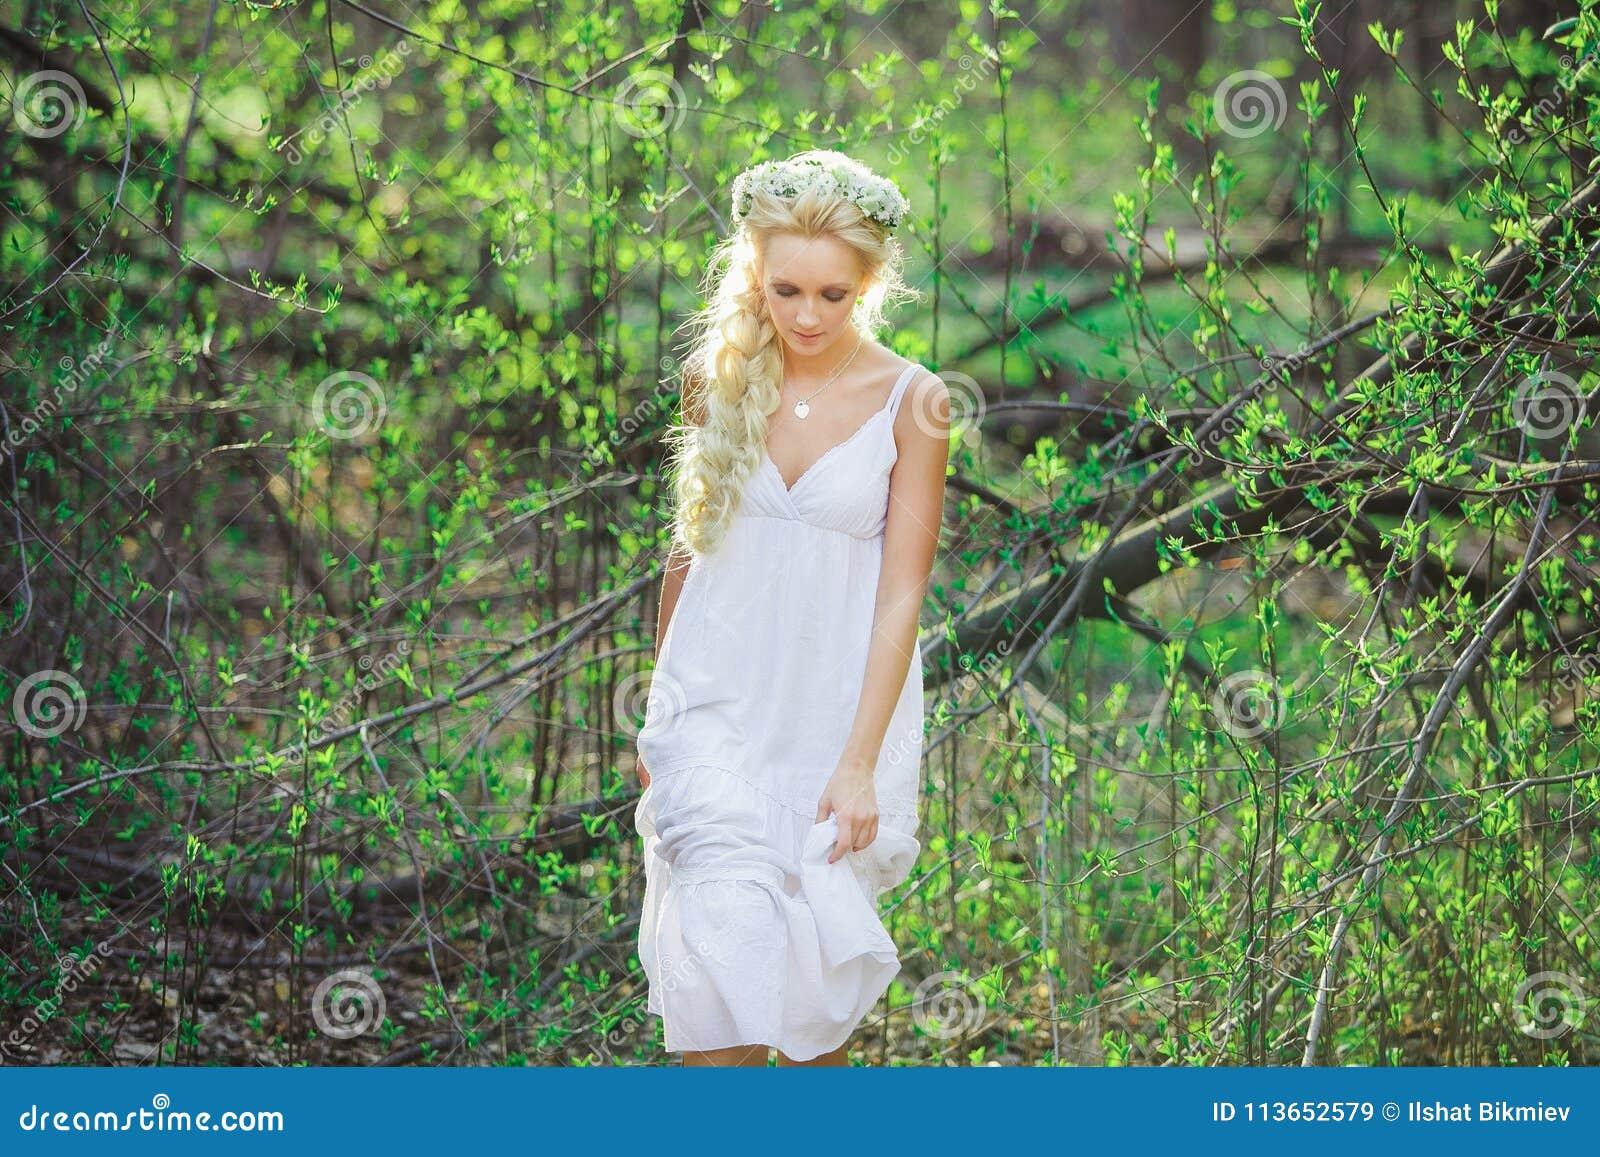 690a94543fad Η όμορφη γυναίκα στο άσπρο φόρεμα και το floral στεφάνι στο κεφάλι της  μεταξύ της άνθησης